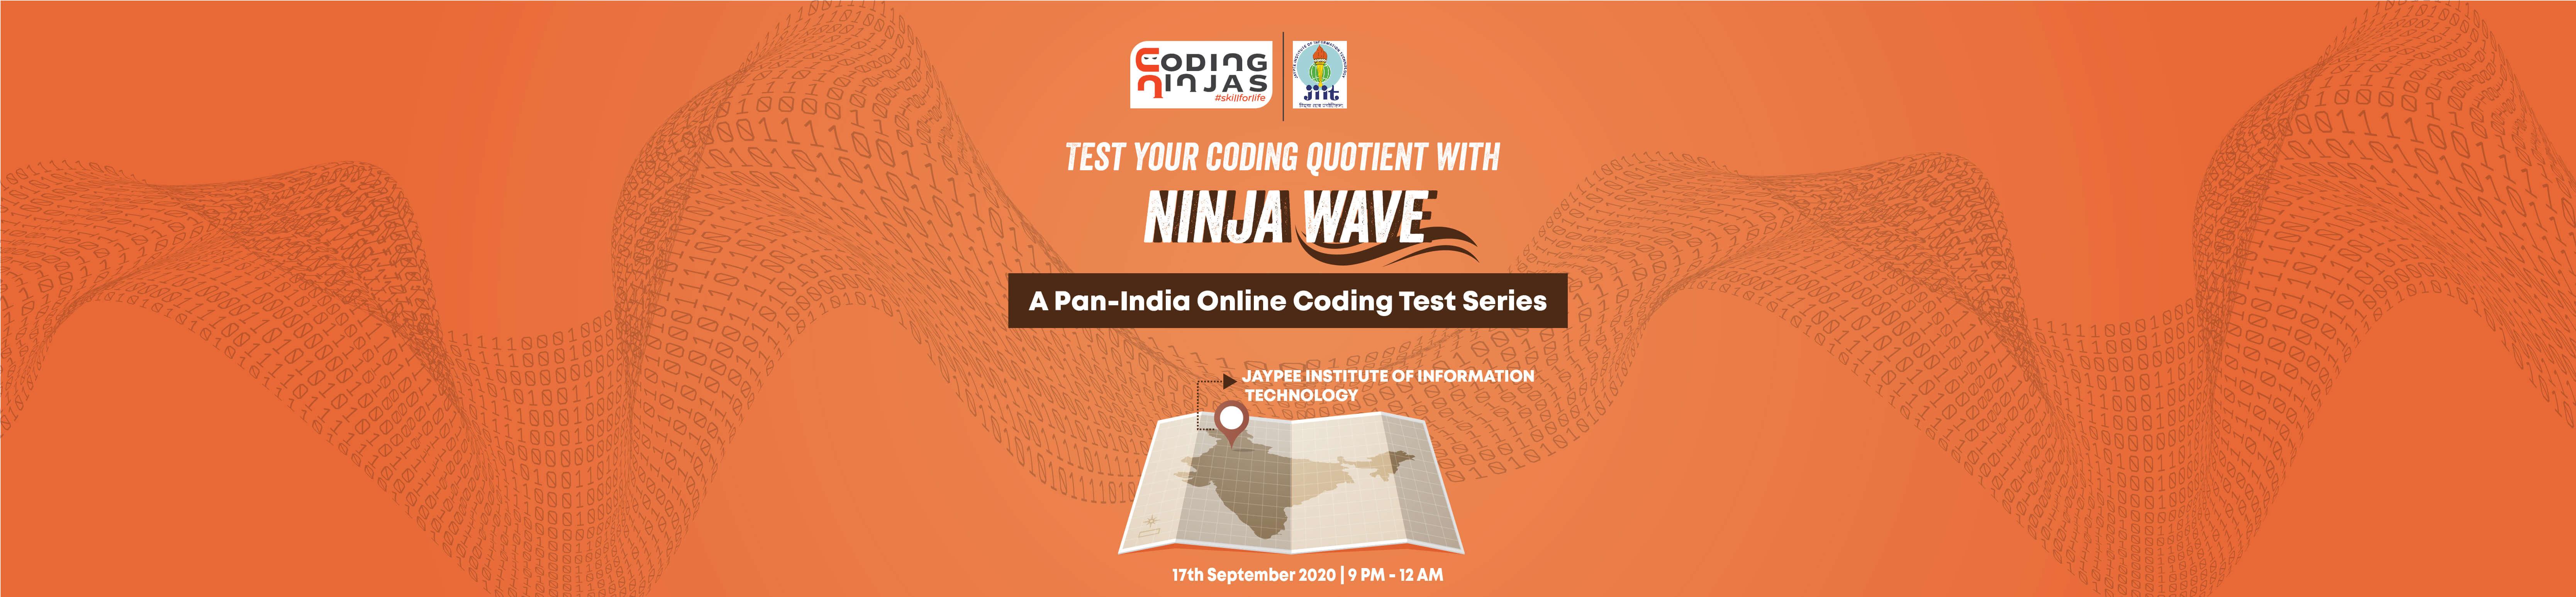 Ninja Wave at Jaypee Institute of Information Technology